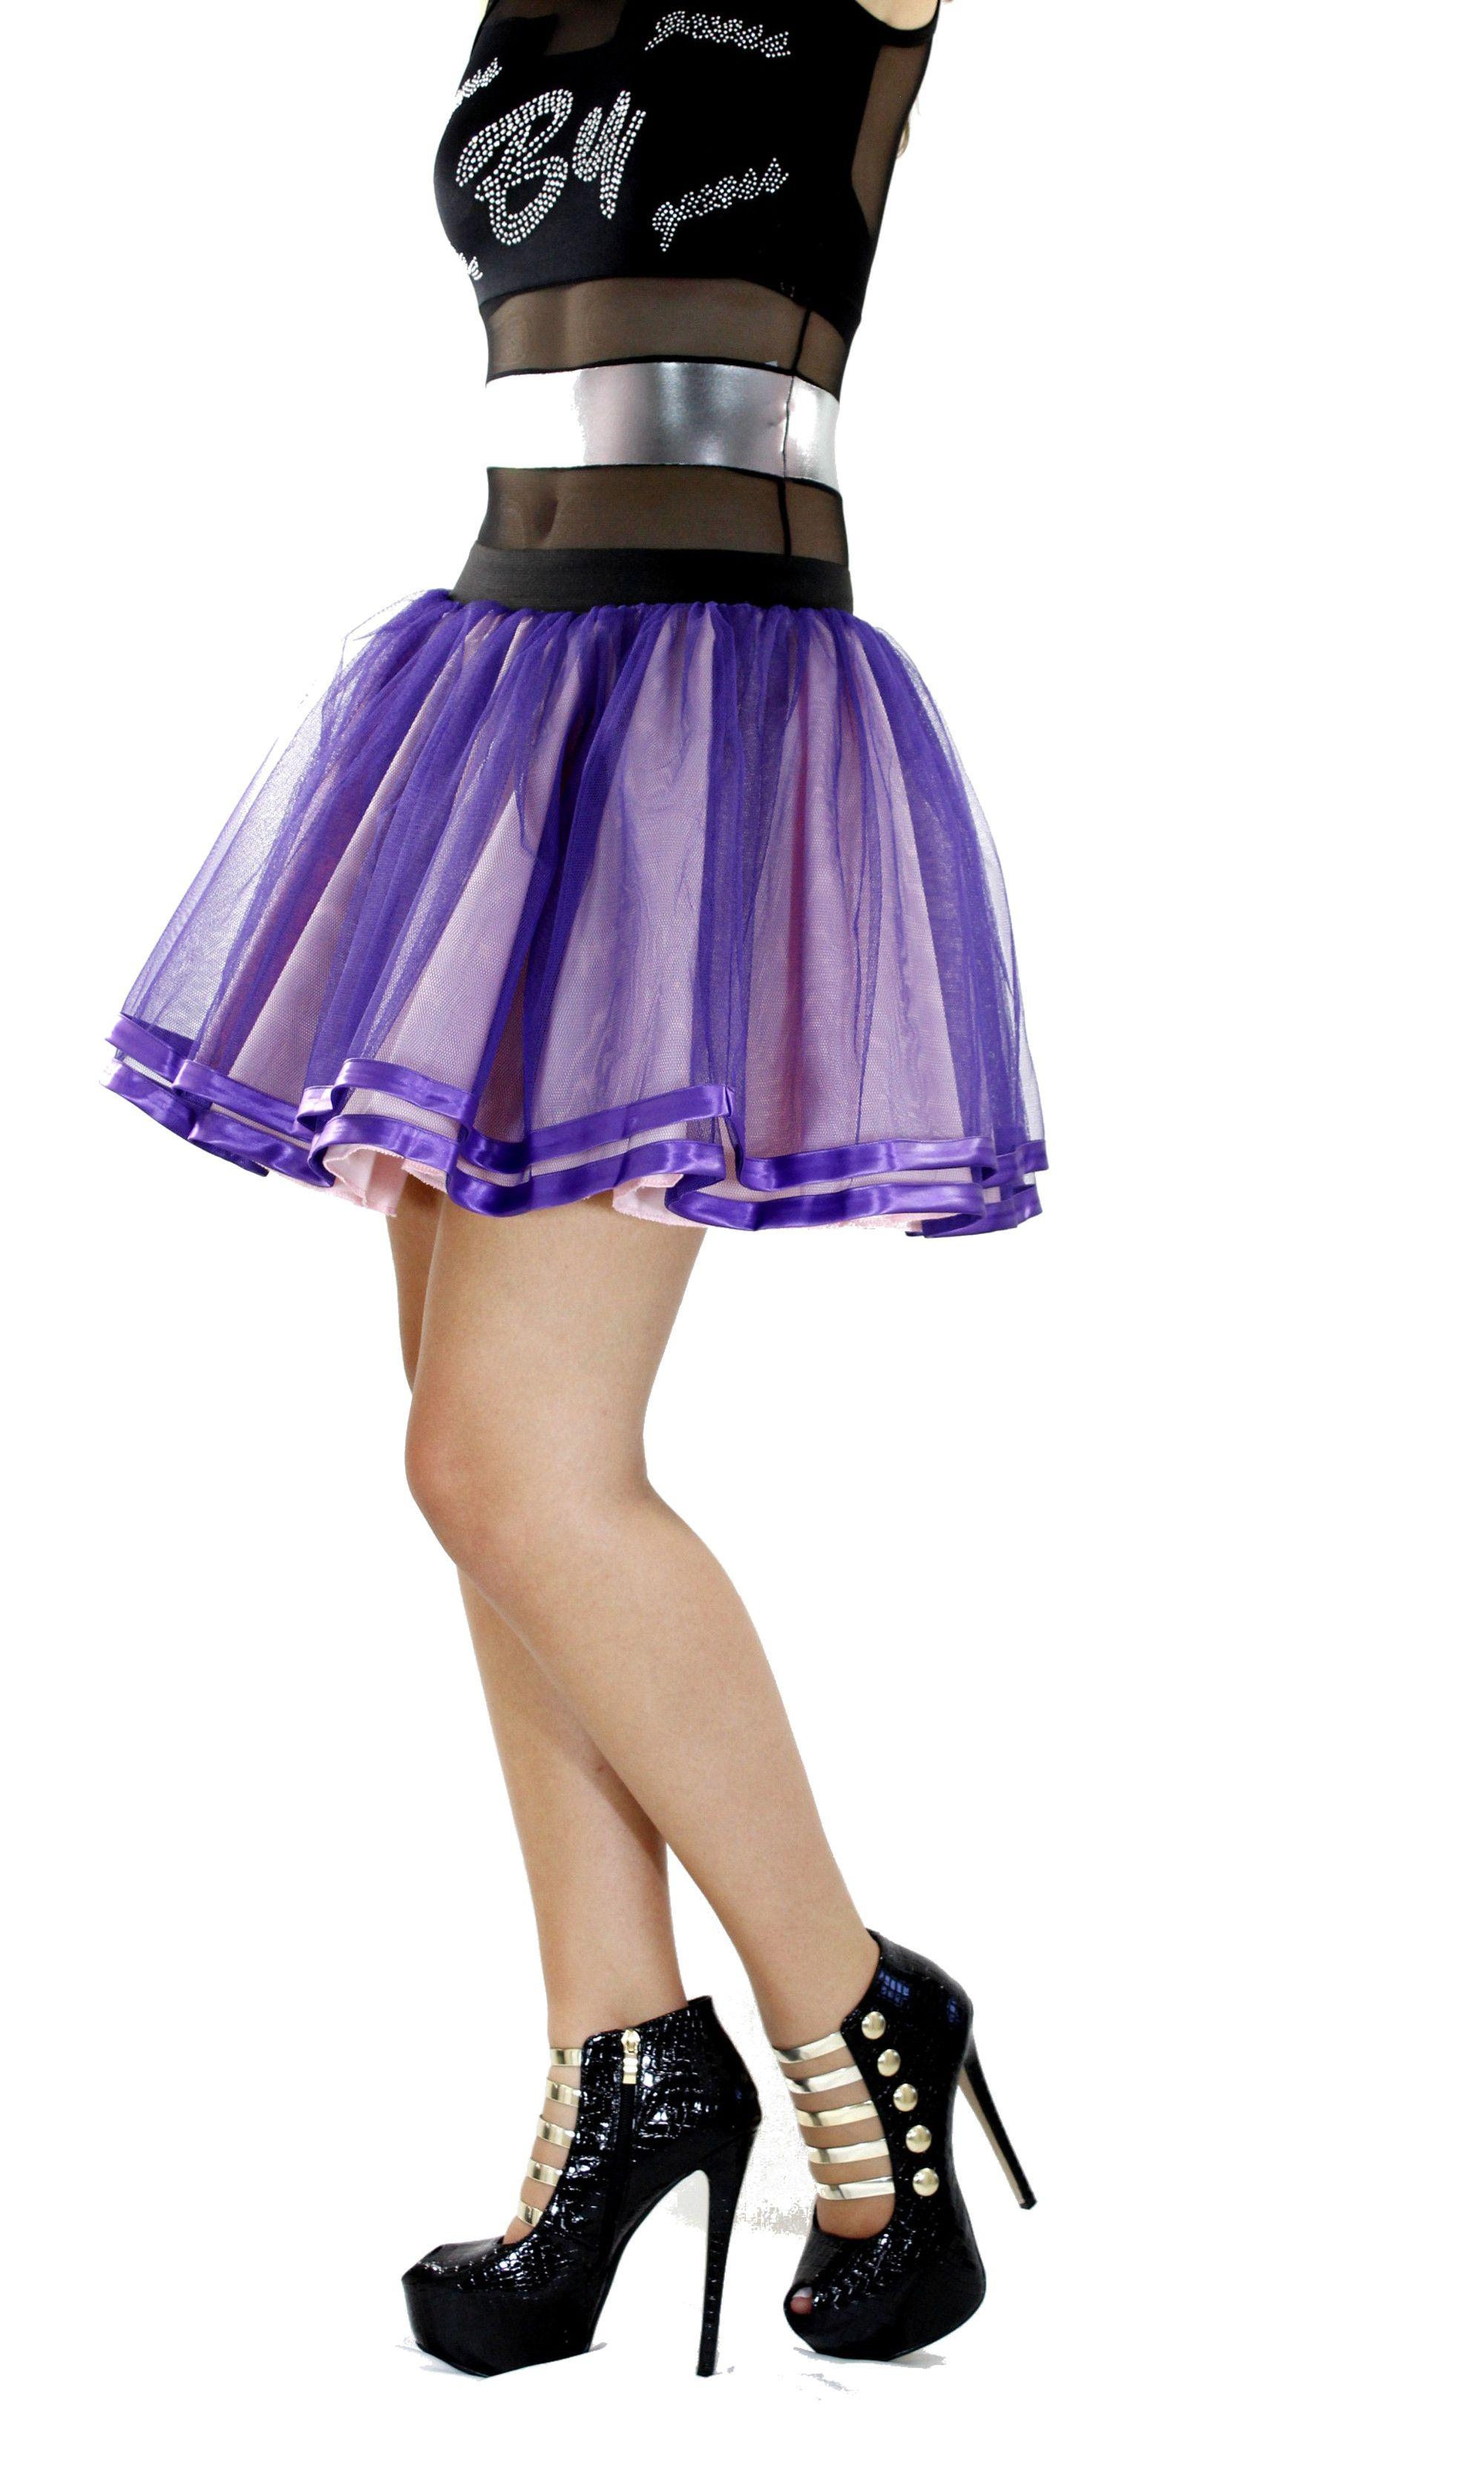 74a6b5b1c Faldas De Tul Morada Hermosas faldas de Tul Morada, a estas faldas ...